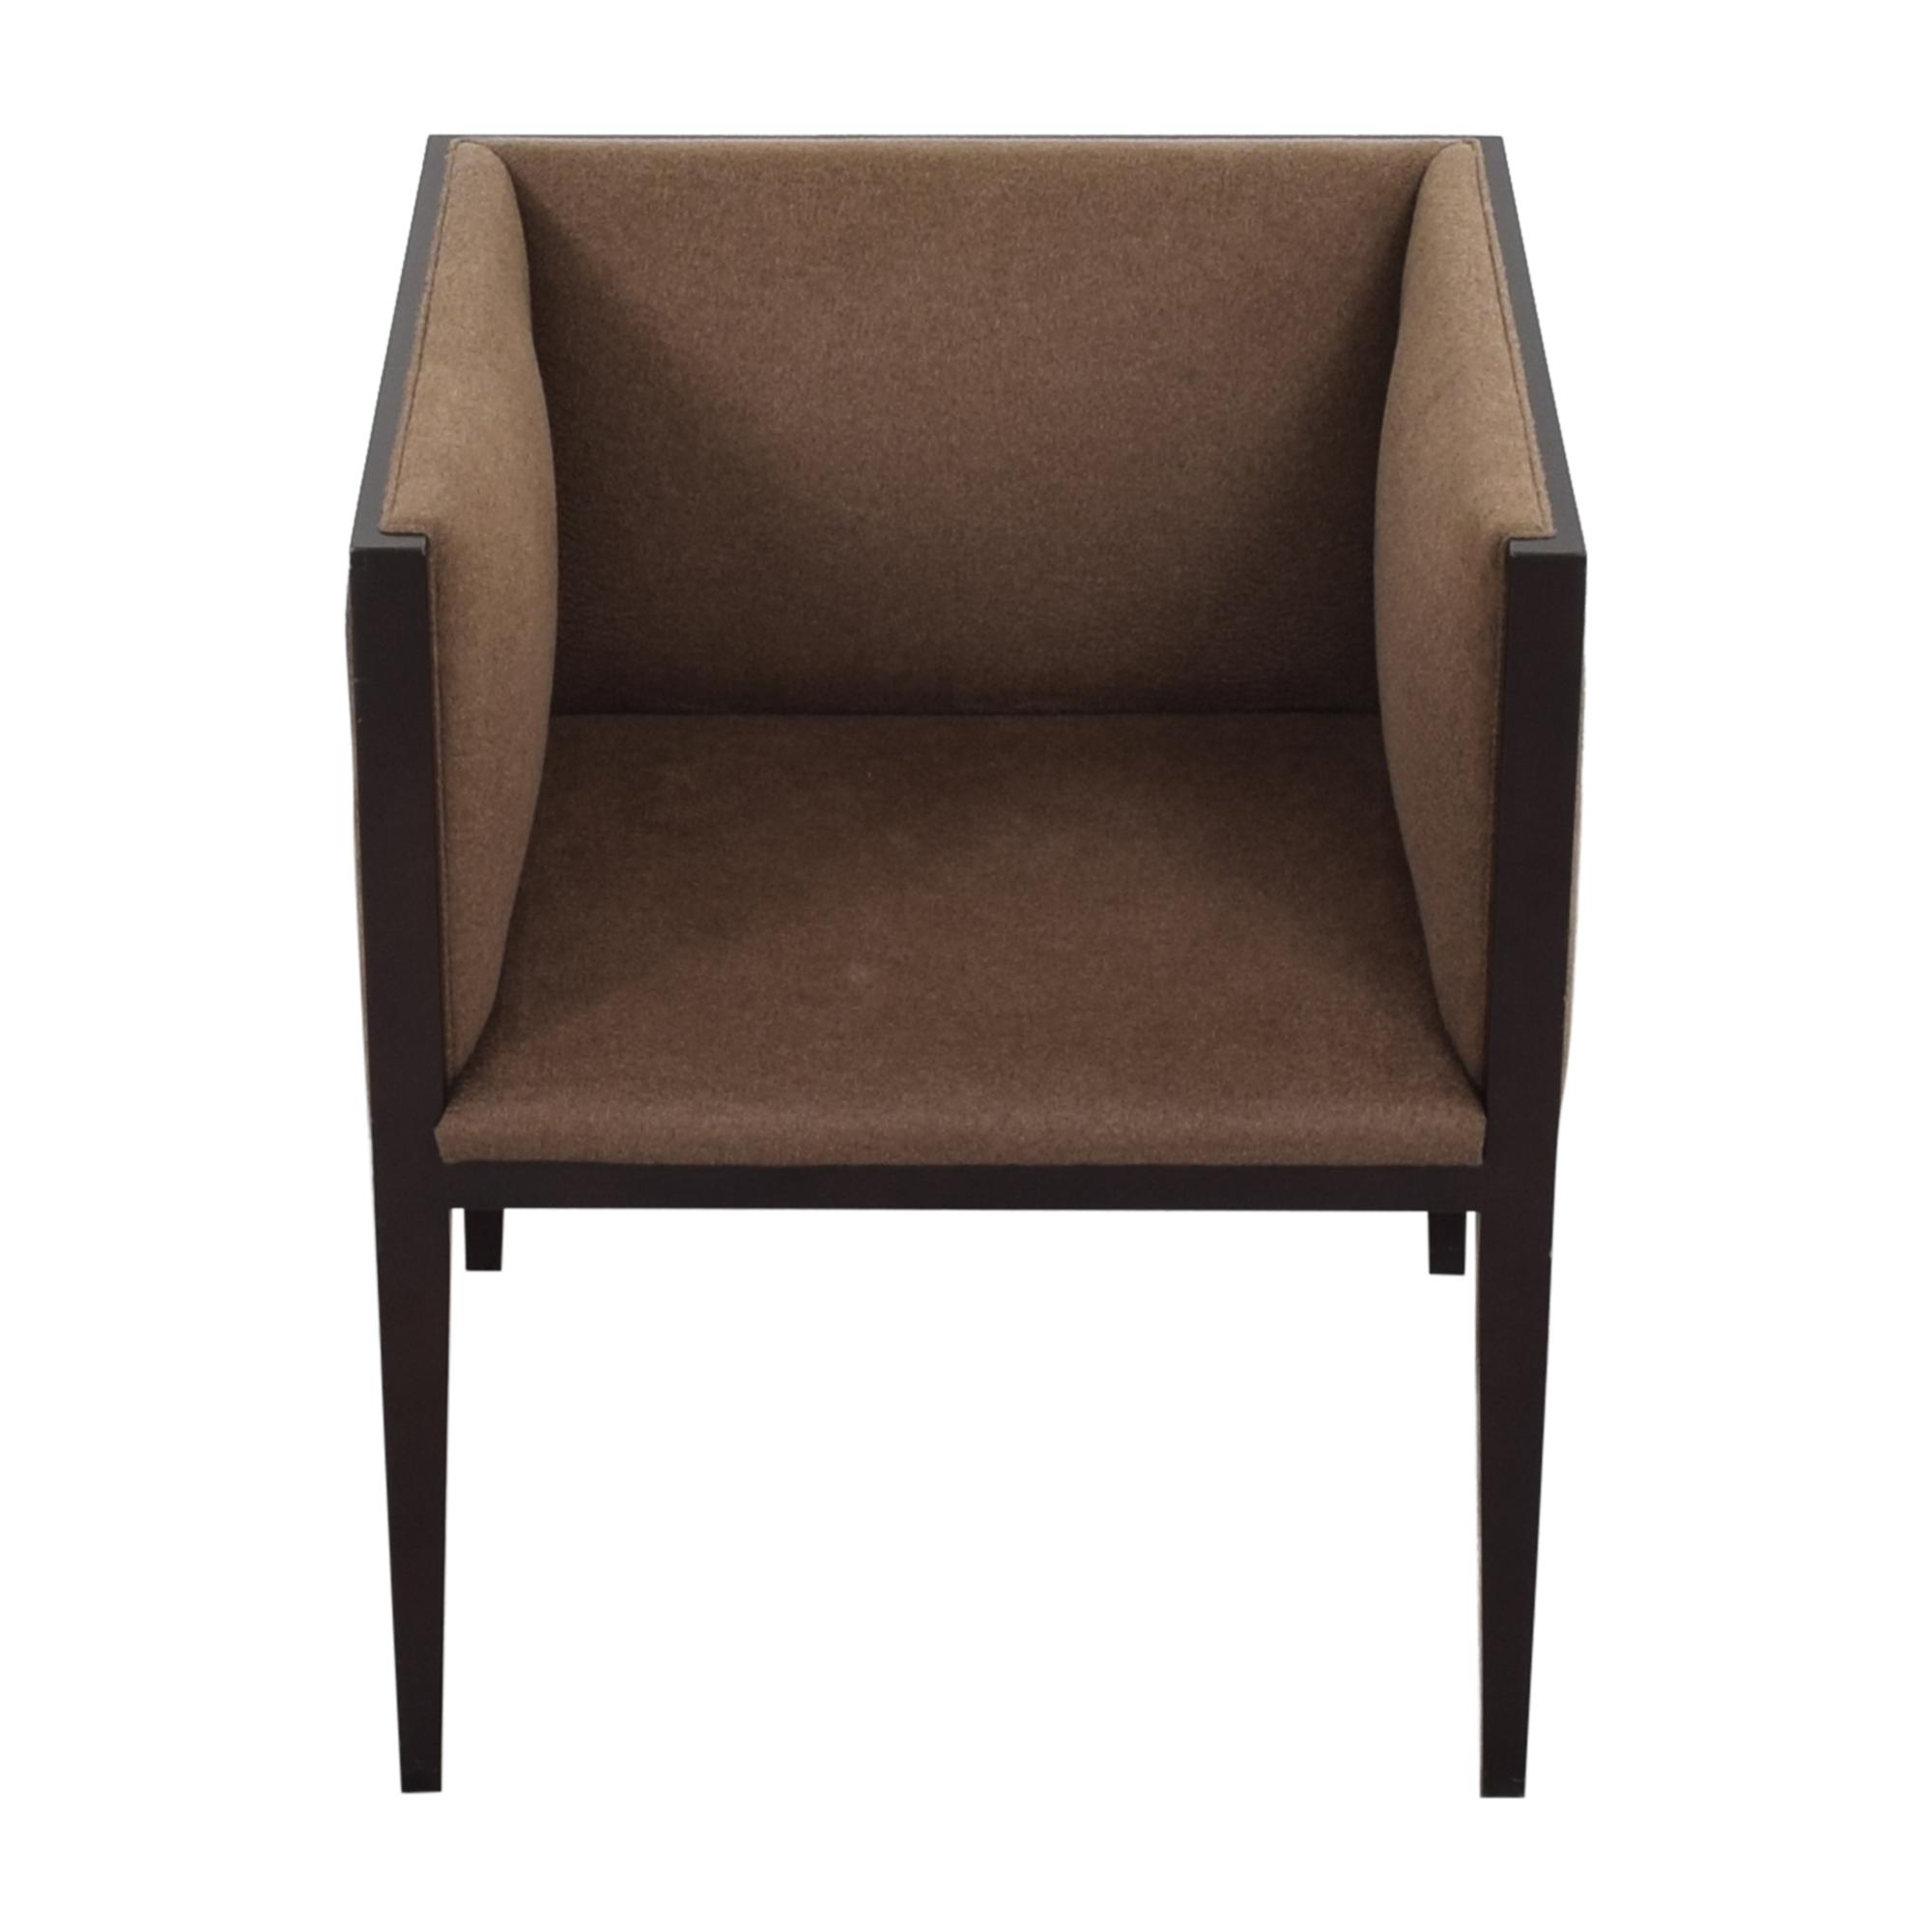 Hudson Furniture & Bedding Hudson Furniture & Bedding Tuxedo Accent Chair brown